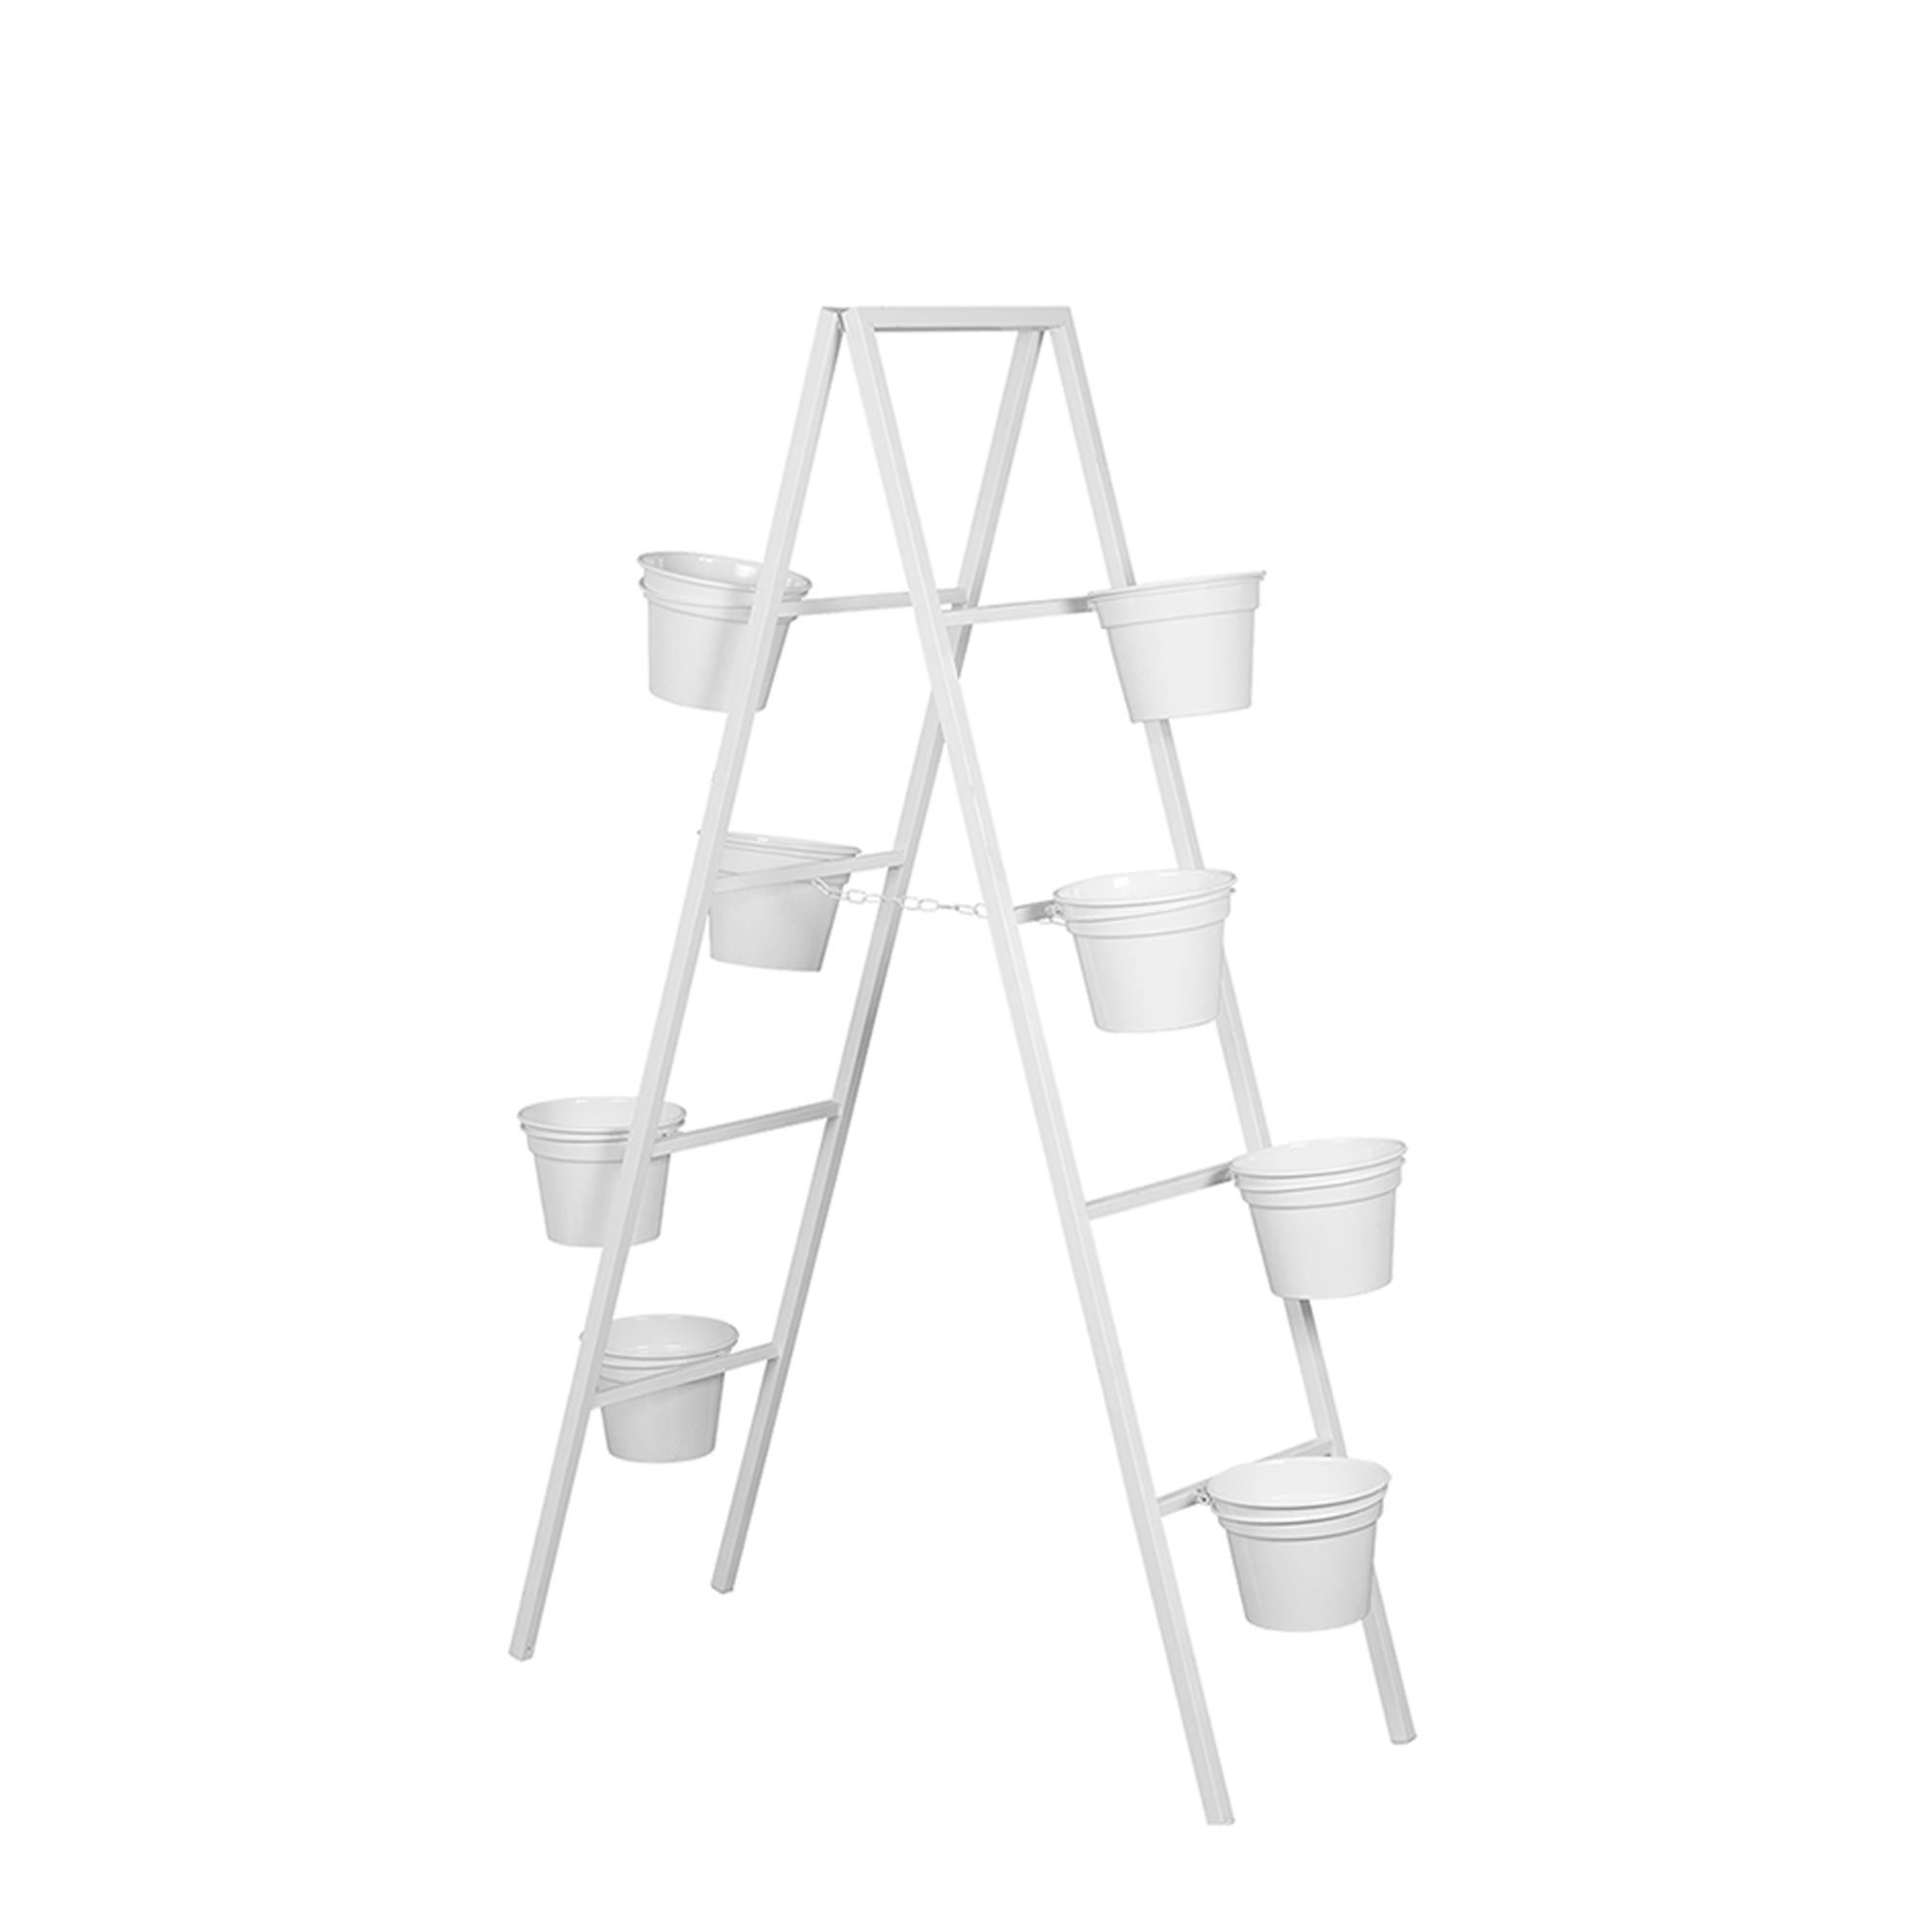 Escada Grande c/ 8 Vasos Aluminio